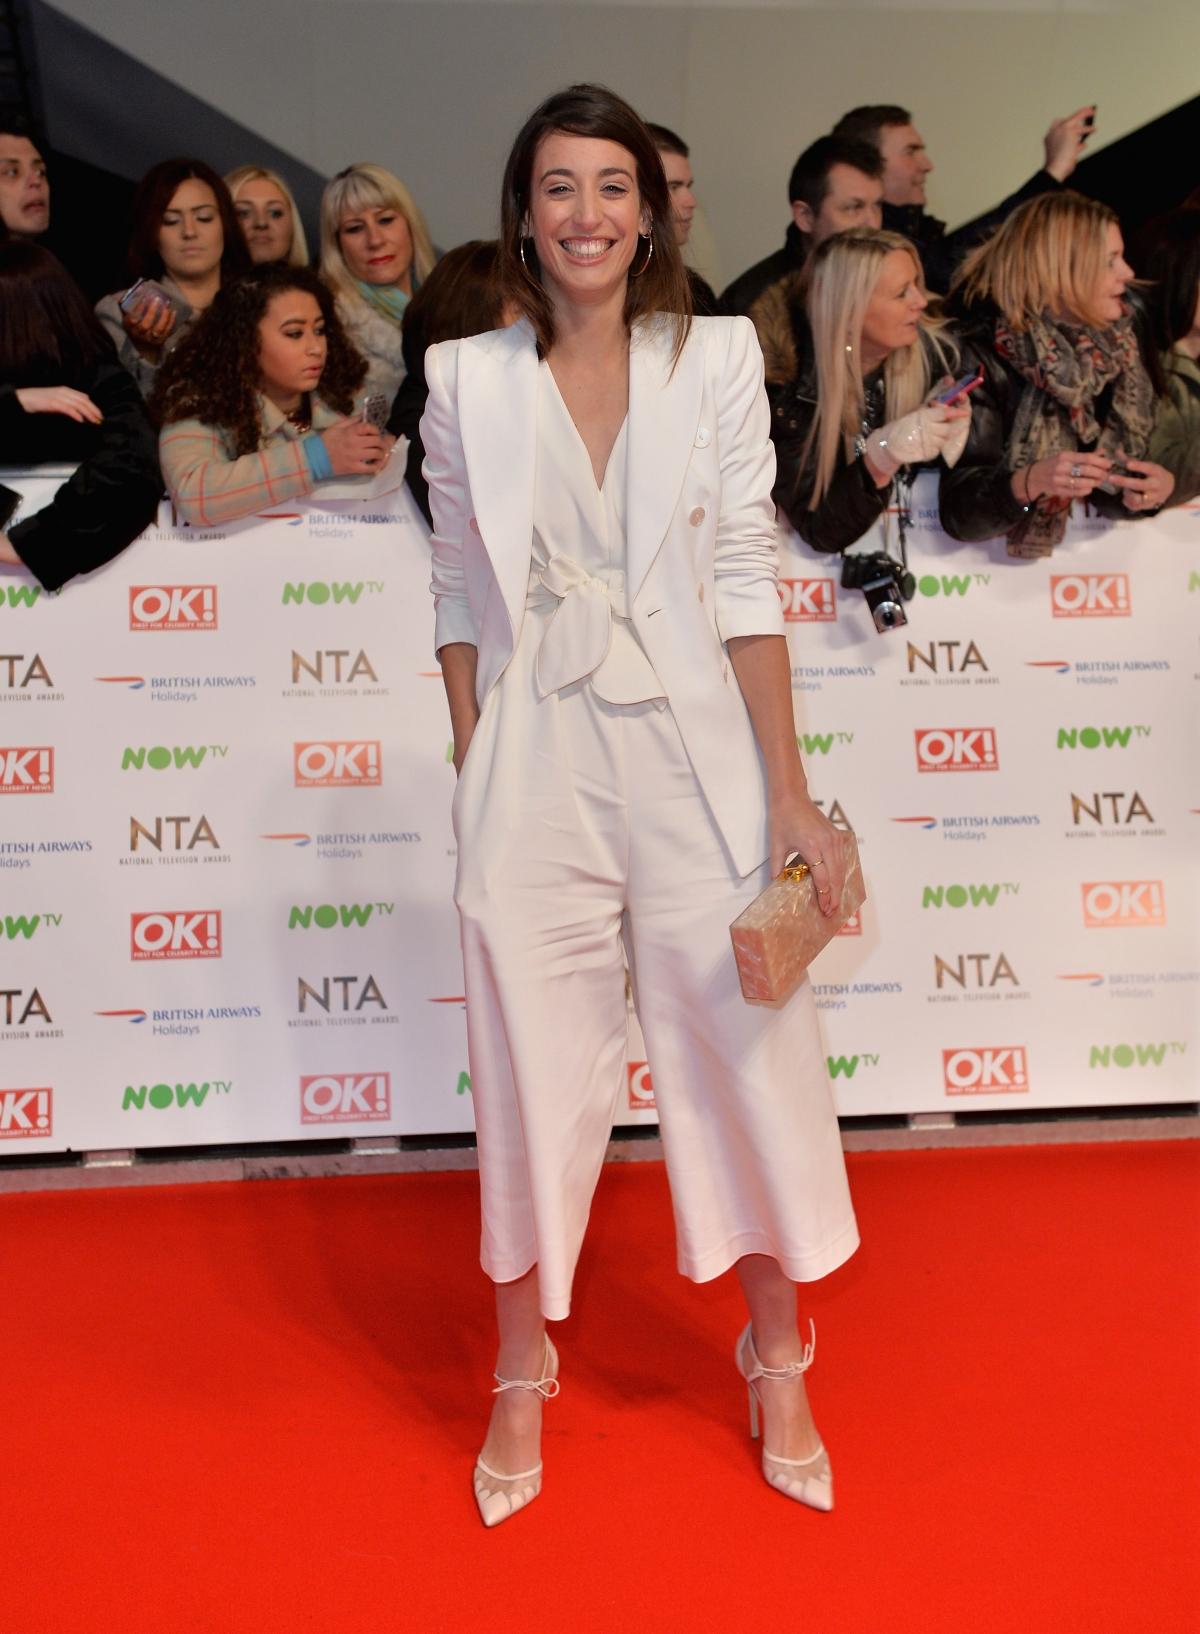 National Television Awards 2016 Red Carpet